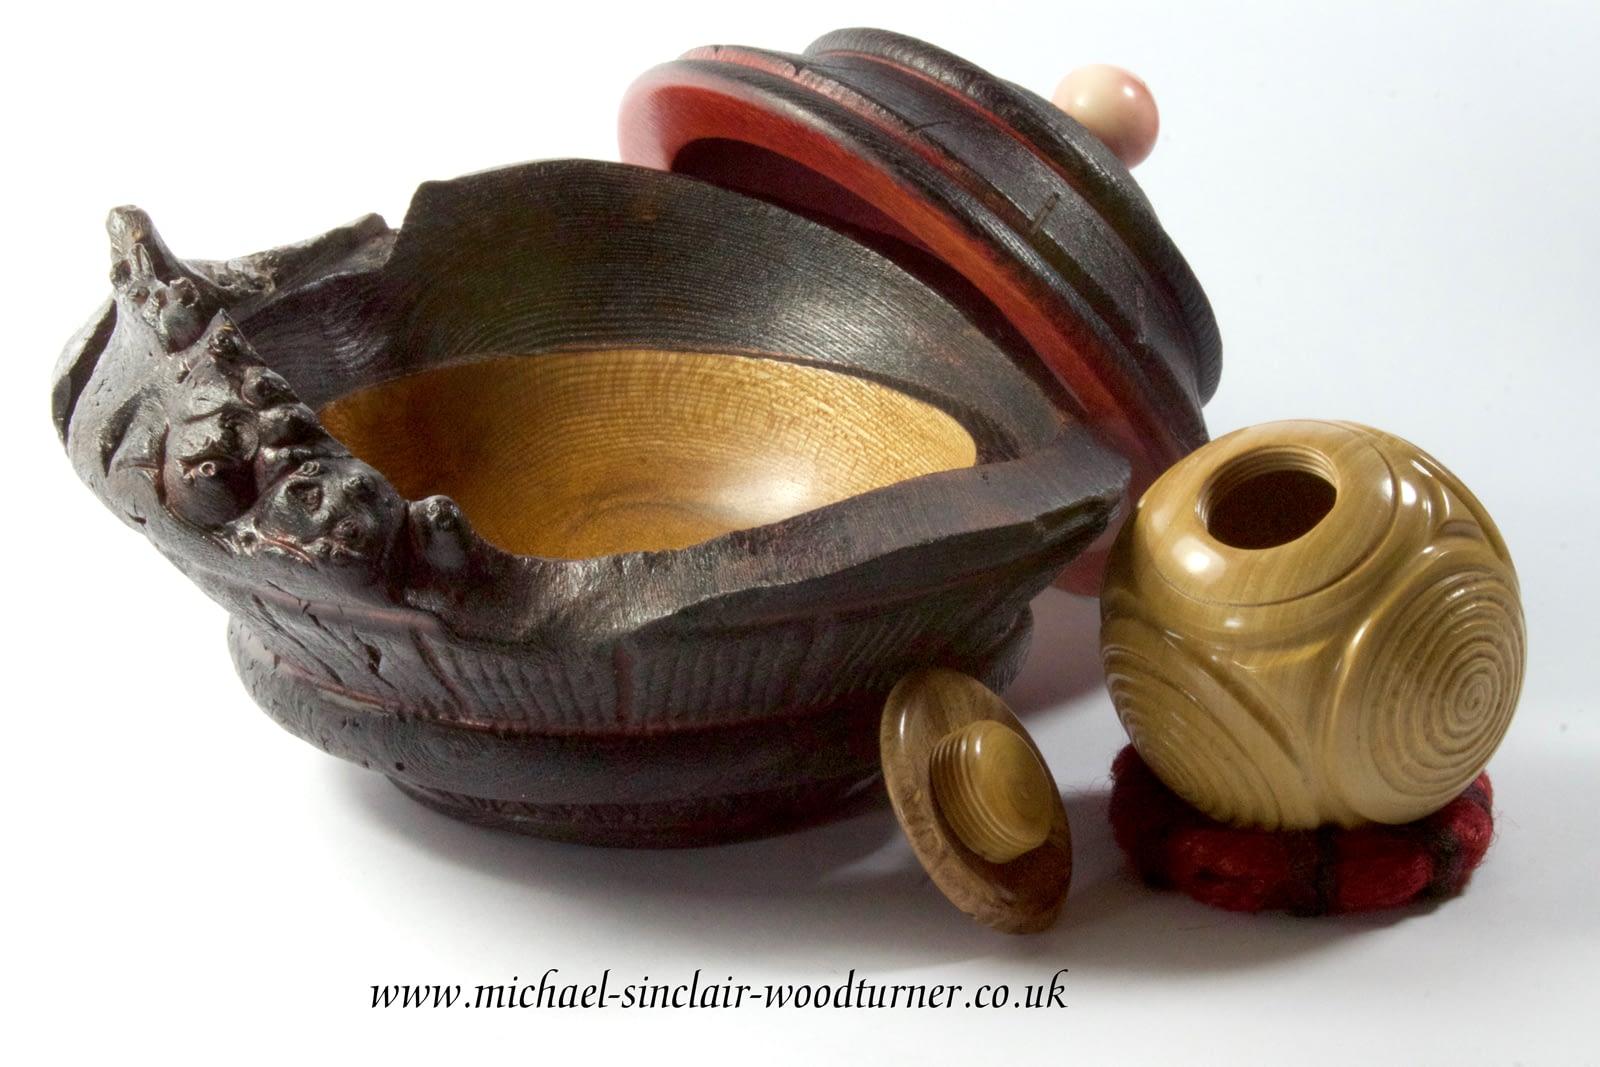 'Howar' ceremonial pot